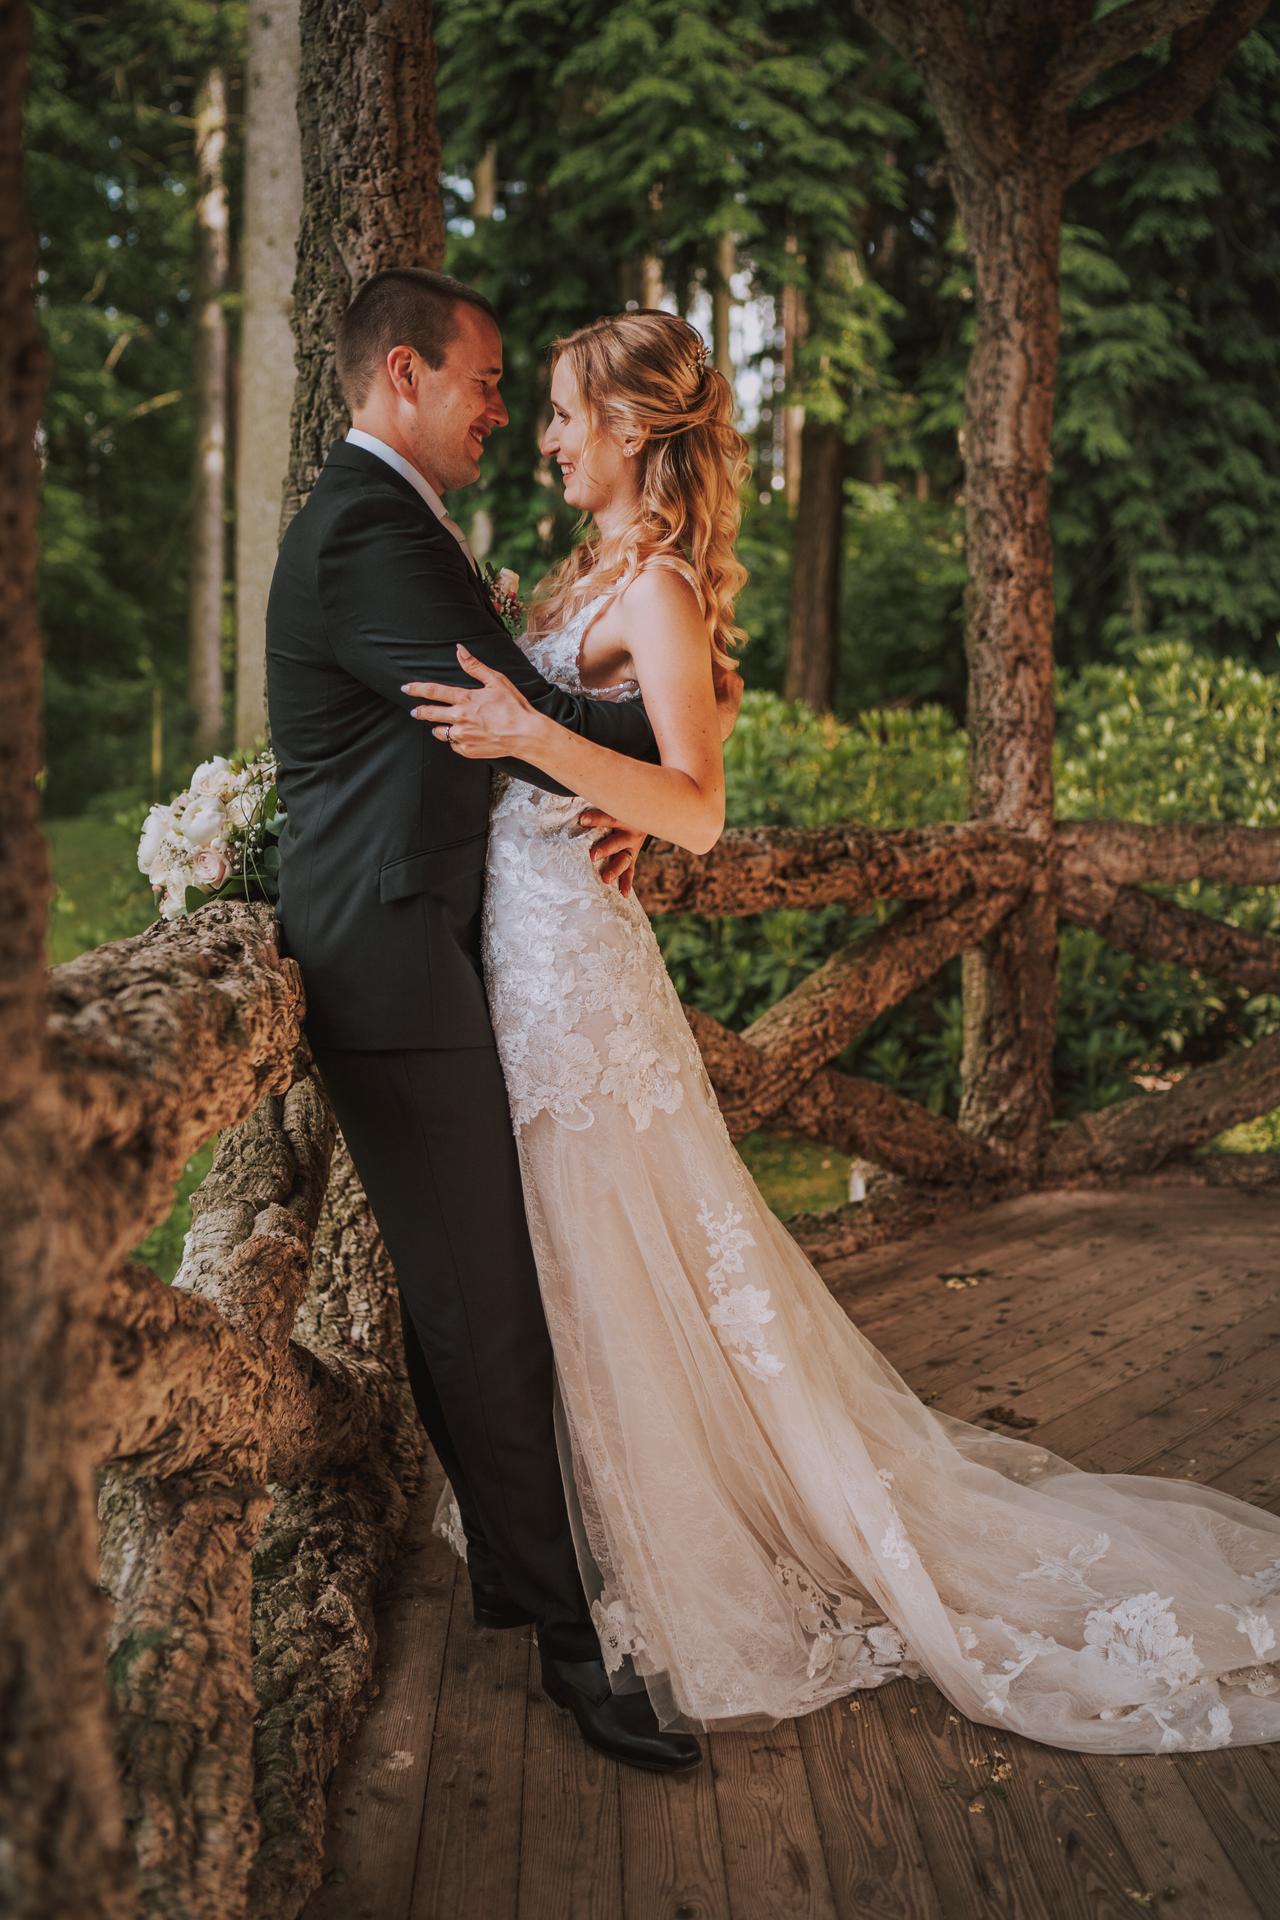 Naše svatba - Obrázek č. 5